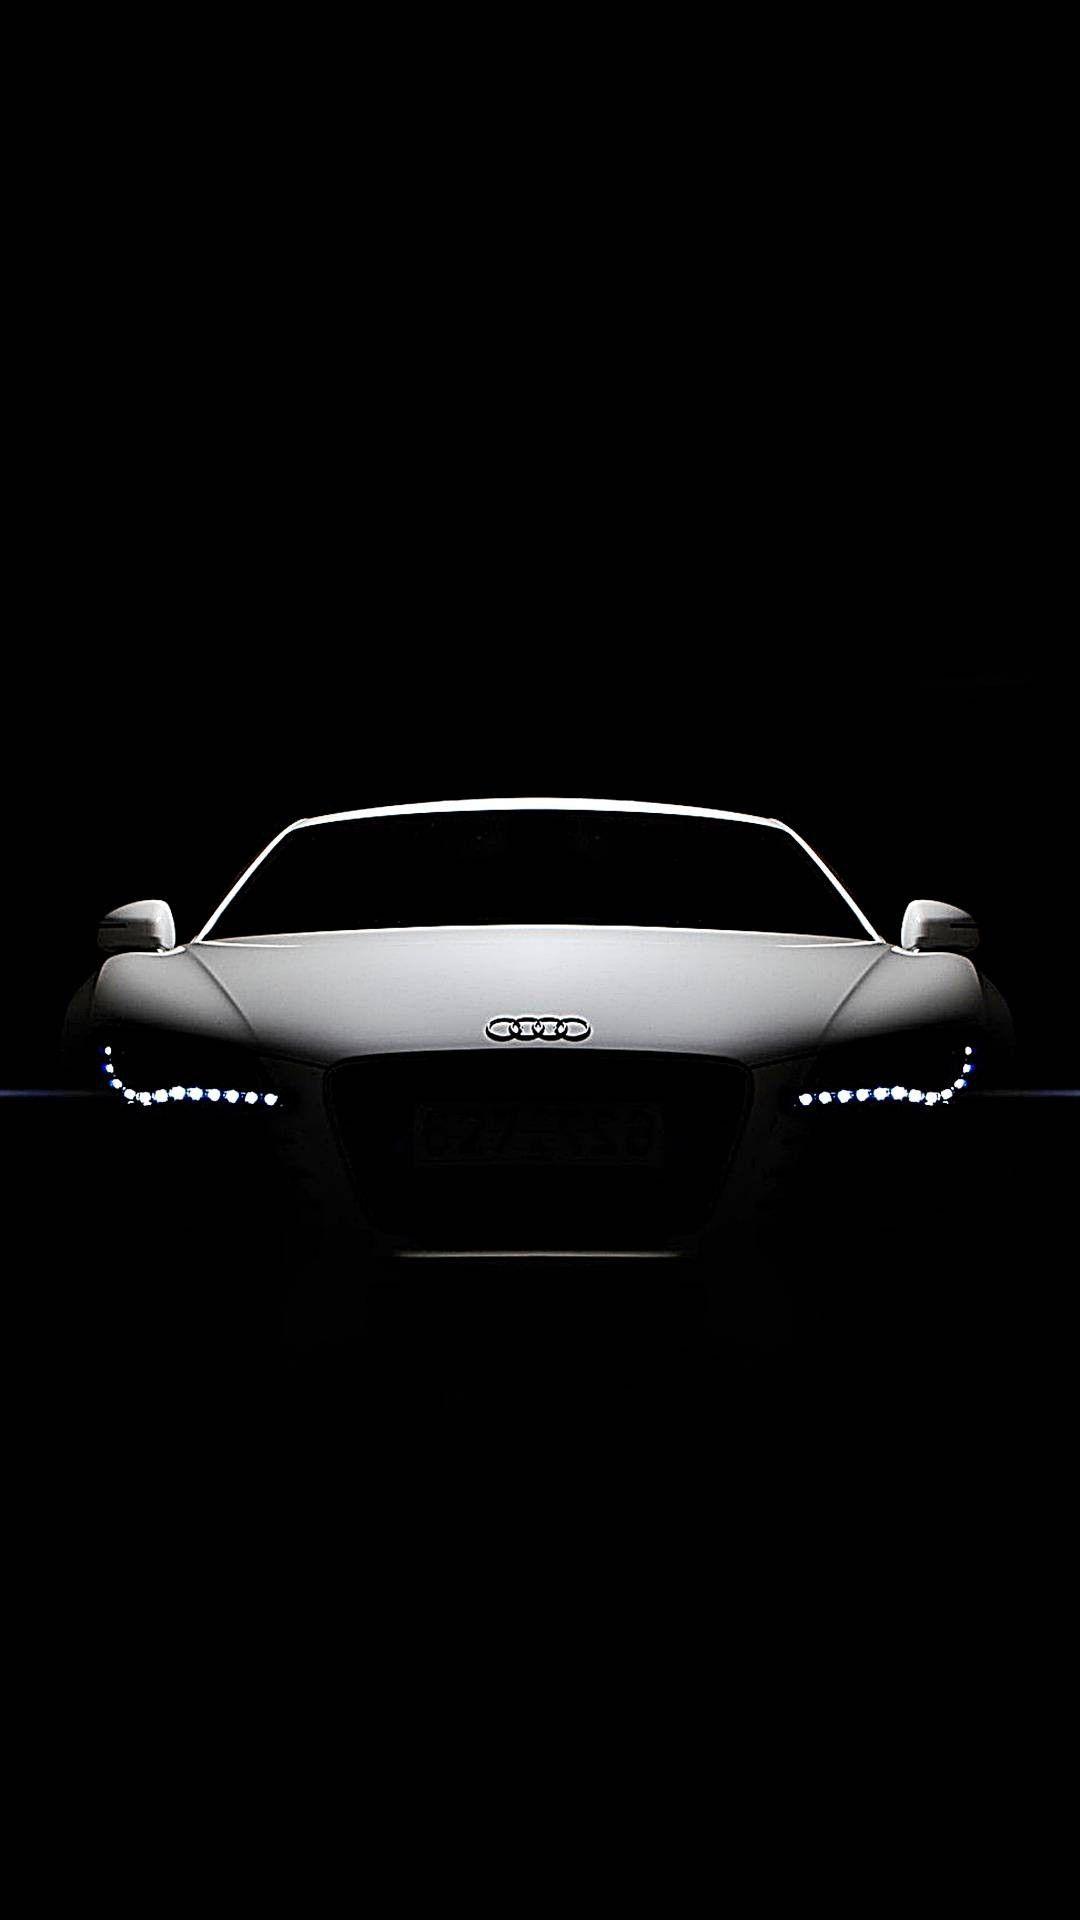 Audi Audi R8 Wallpaper 4 Door Sports Cars Audi Cars